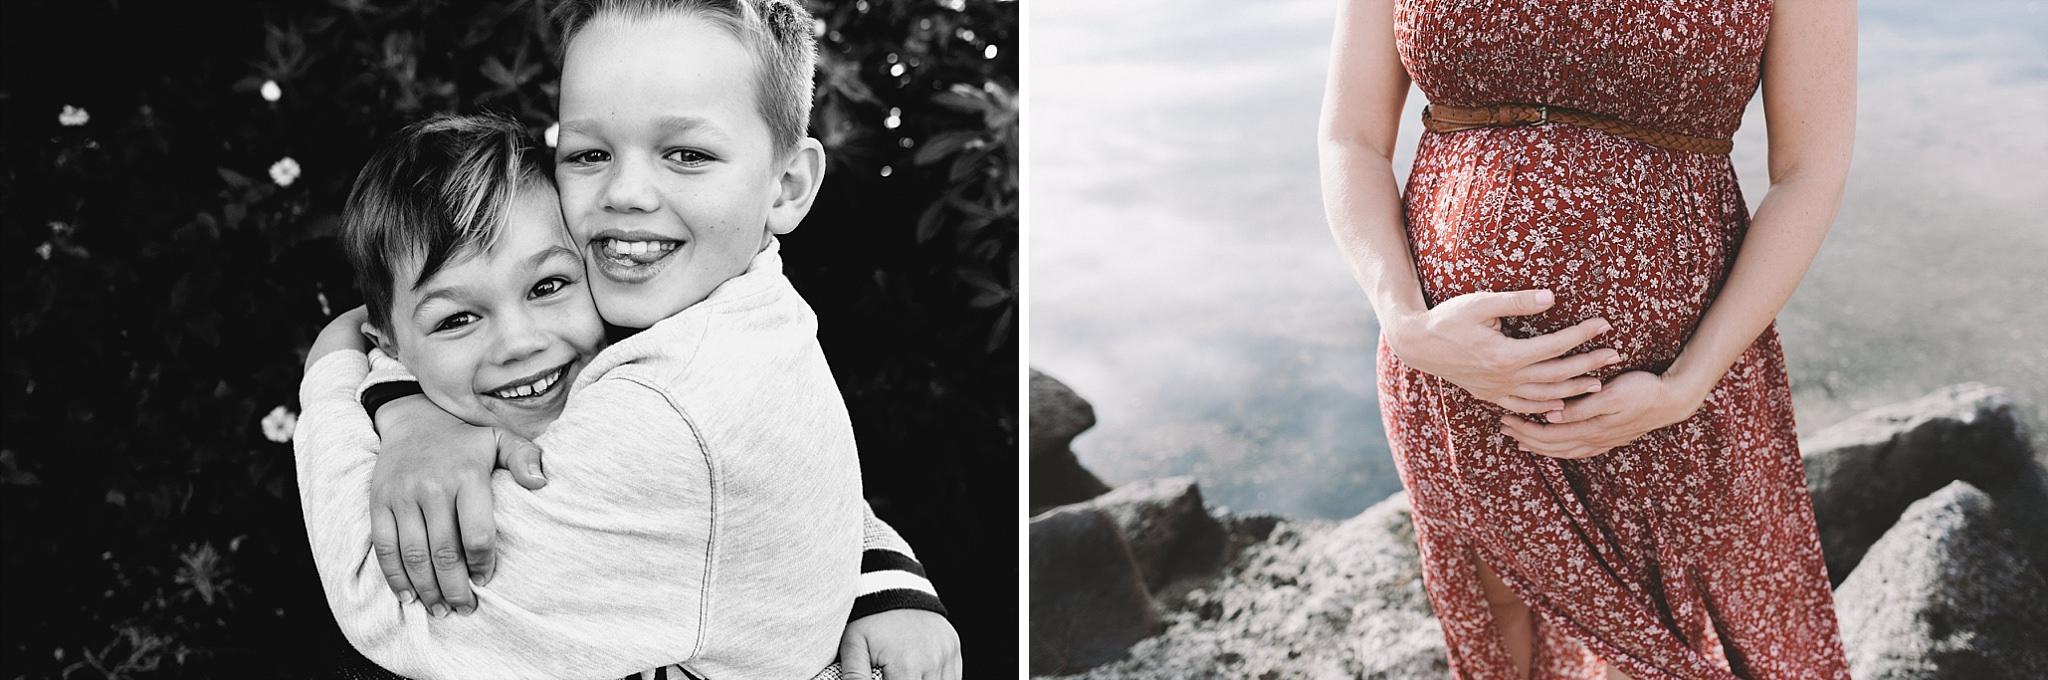 Lecinda Ward, Melbourne Family Newborn and Wedding Photographer_0010.jpg